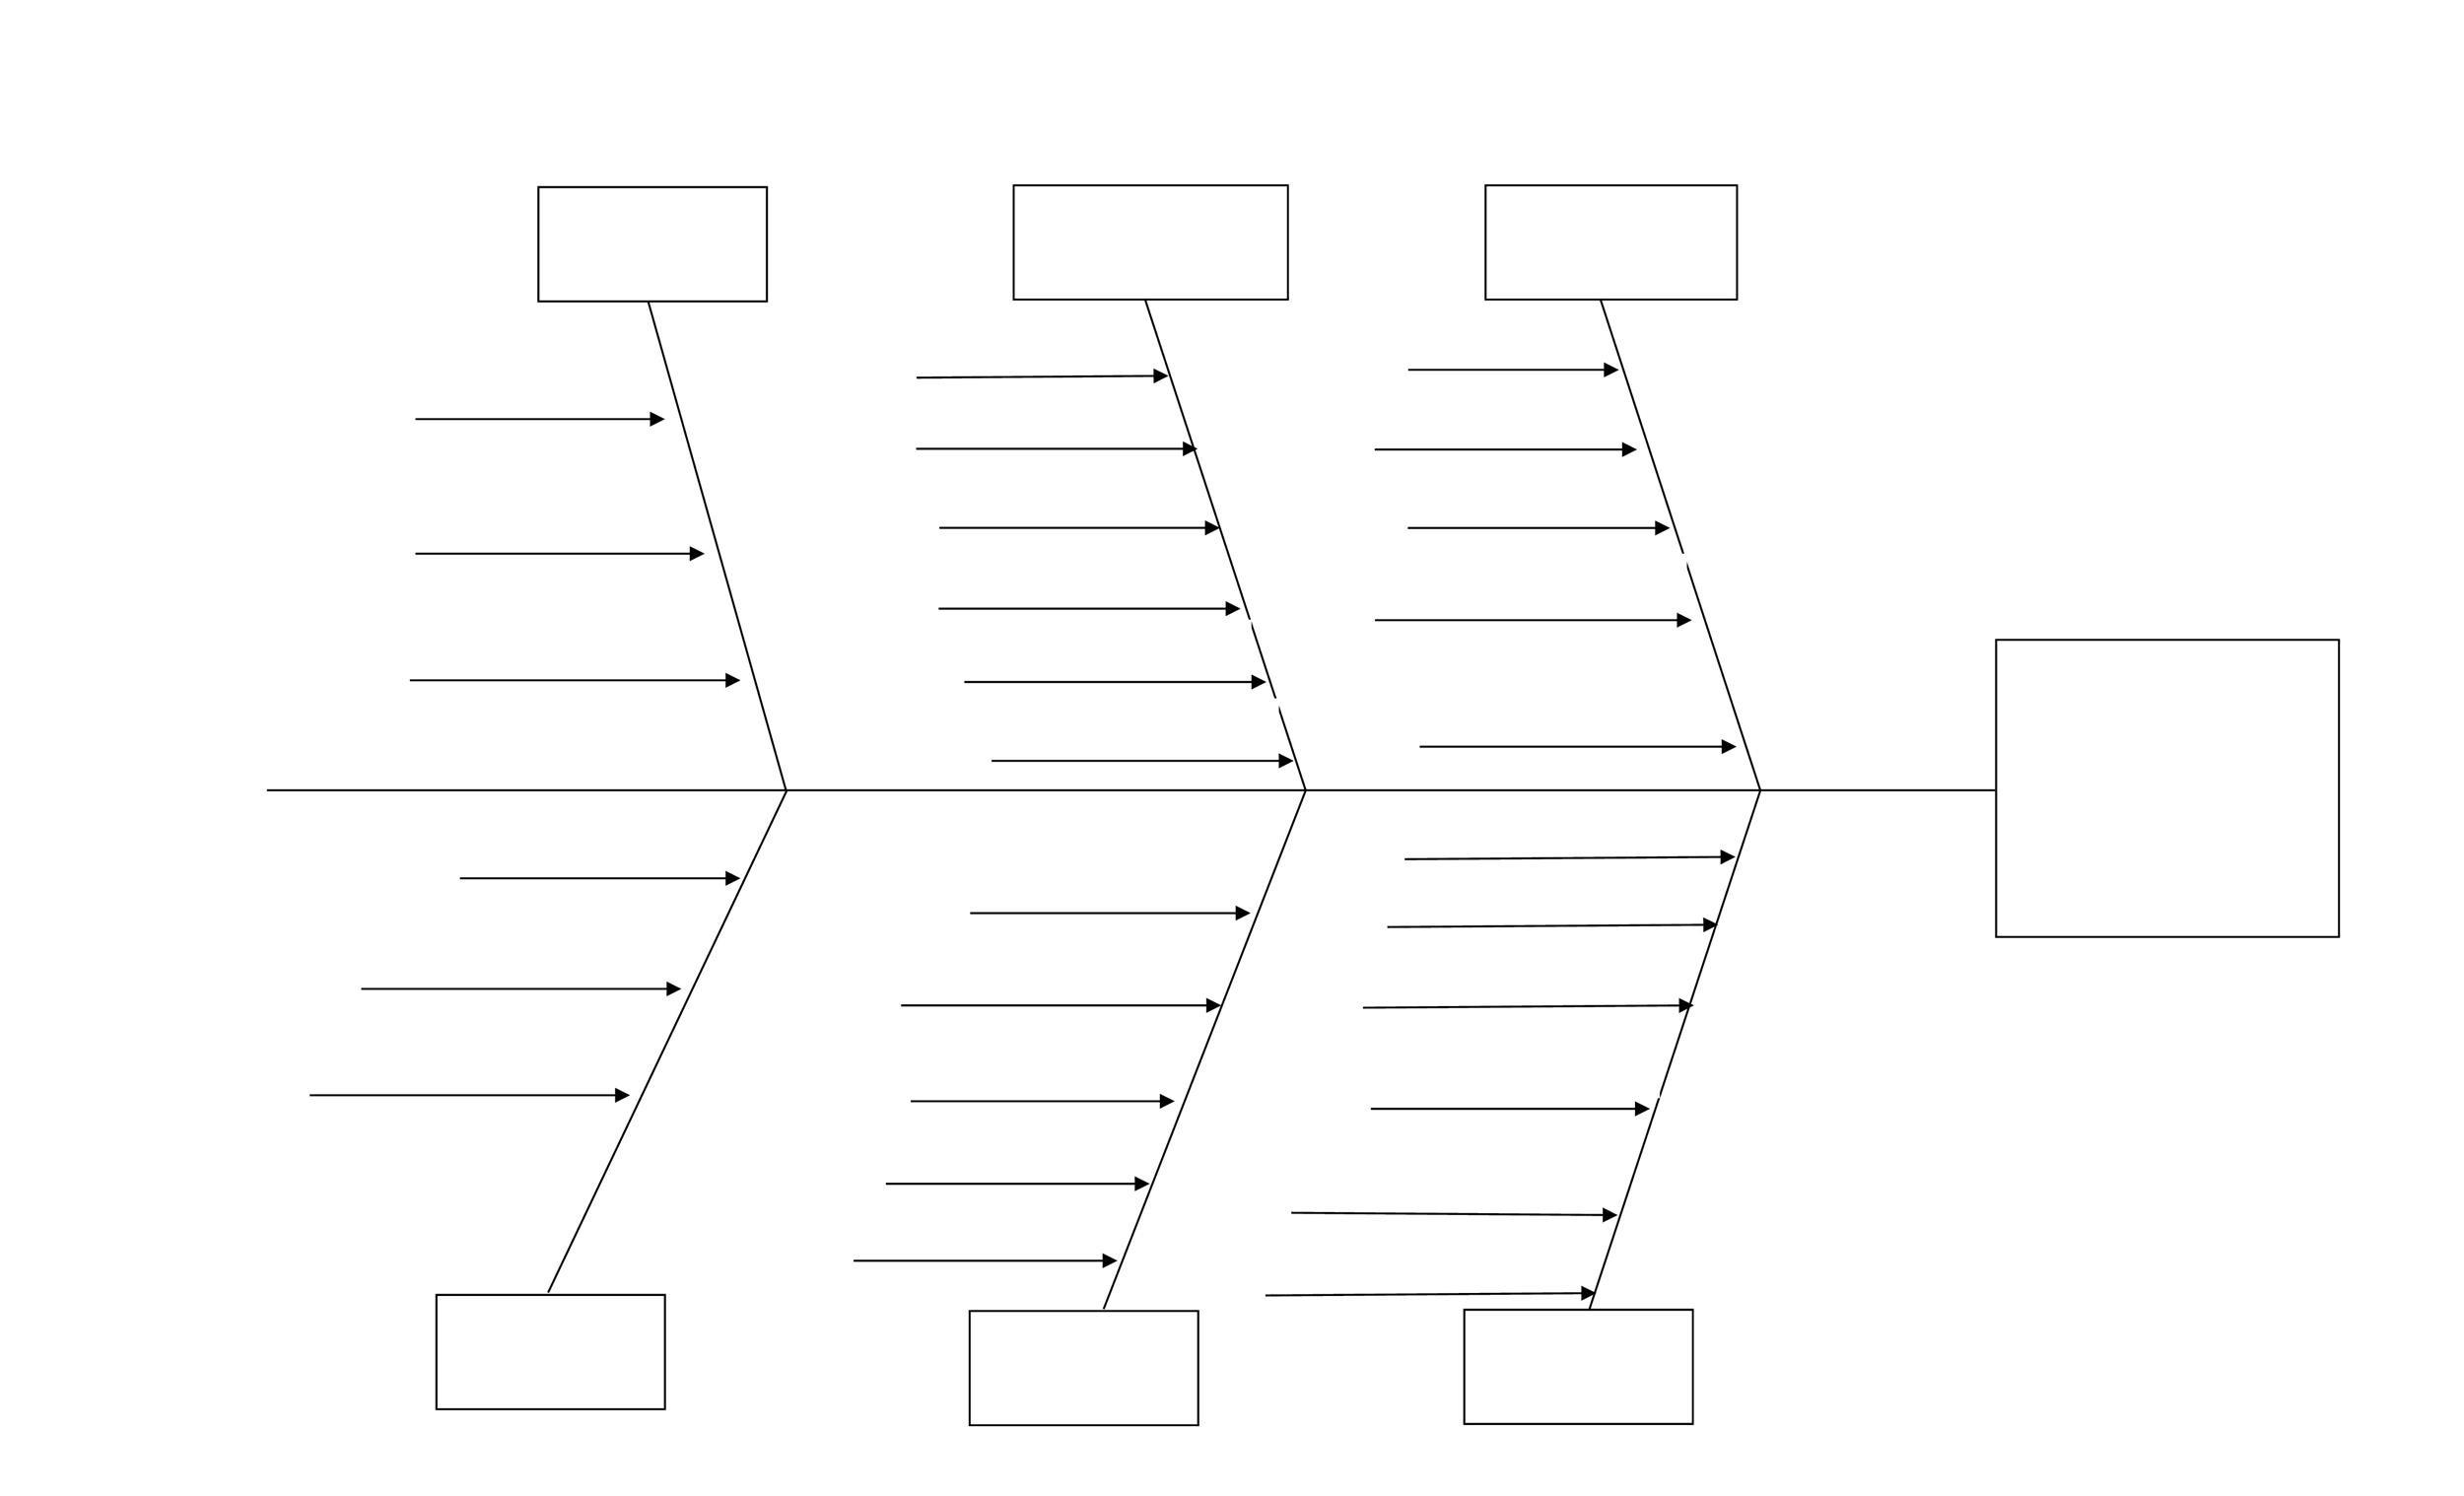 ishikawa fishbone diagram template 2006 toyota yaris radio wiring 43 great templates examples word excel free 02